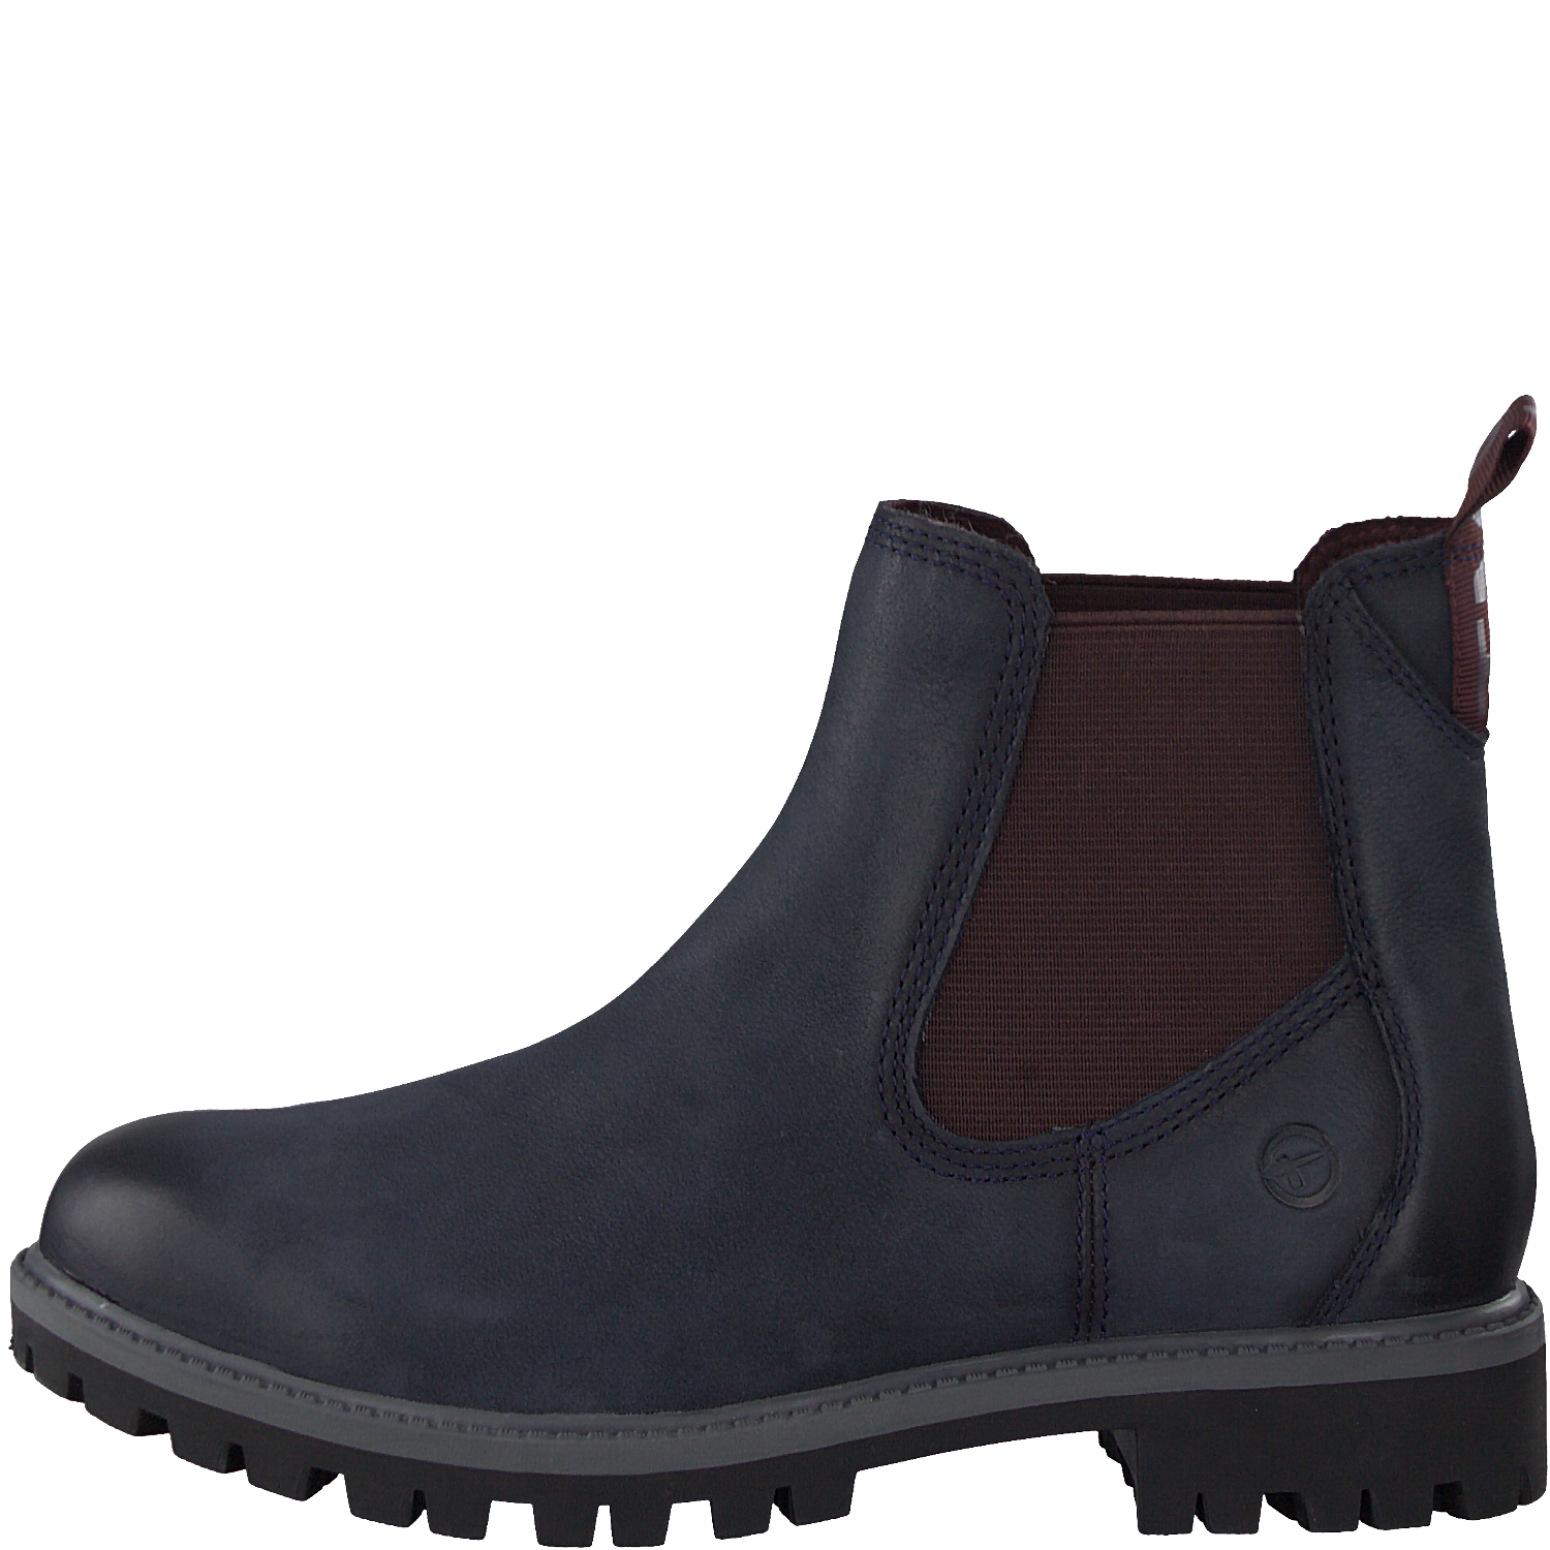 Details zu Tamaris Chelsea Boots 1 25401 23 Damen Schuhe Leder Stiefeletten